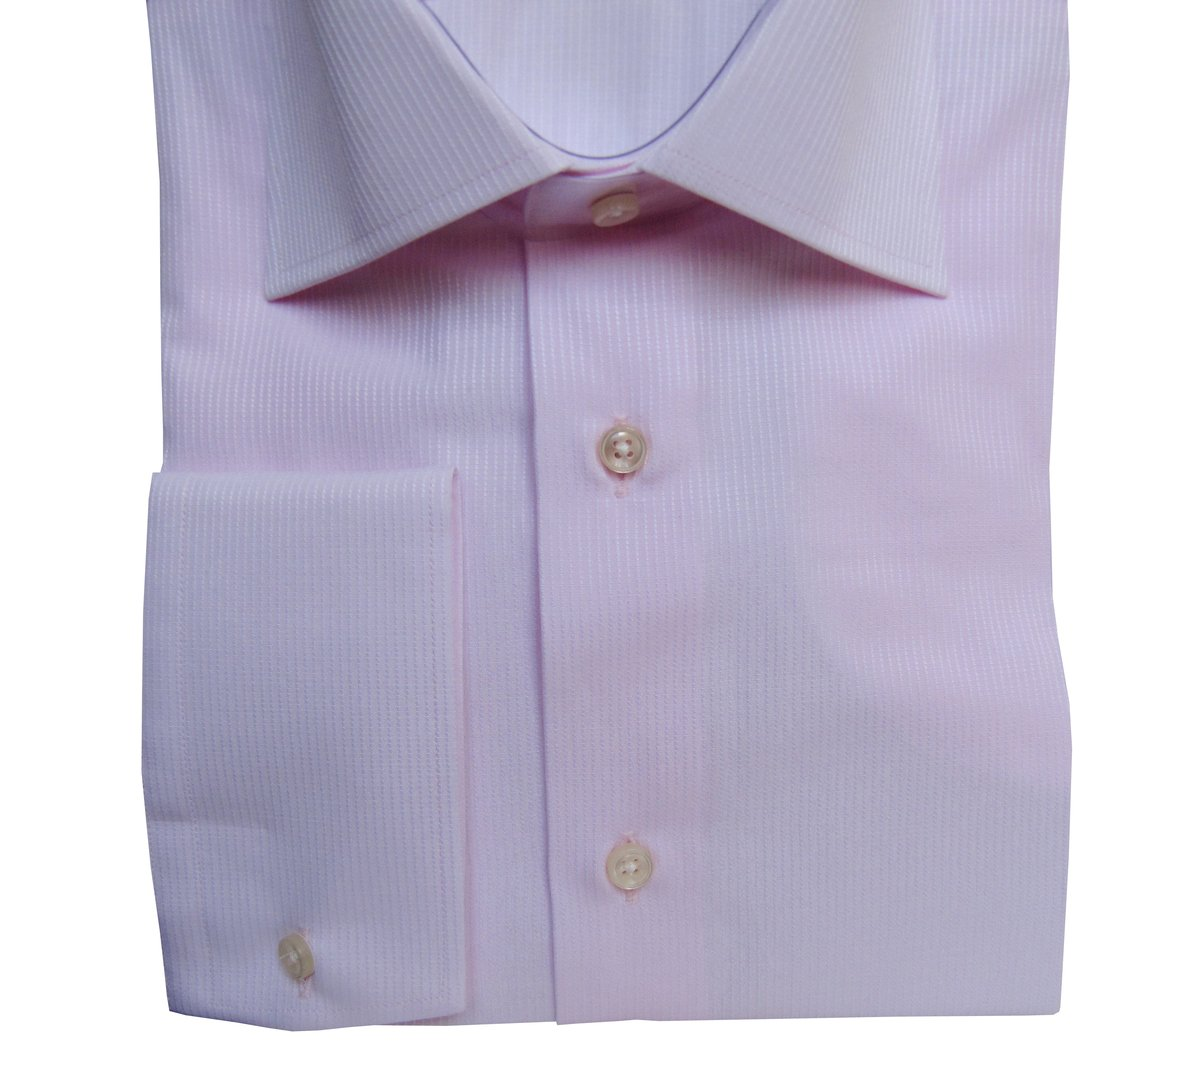 best website c8137 65618 Elegante Uni Streifen Hemd Slim-fit - Muga Herrenausstatter